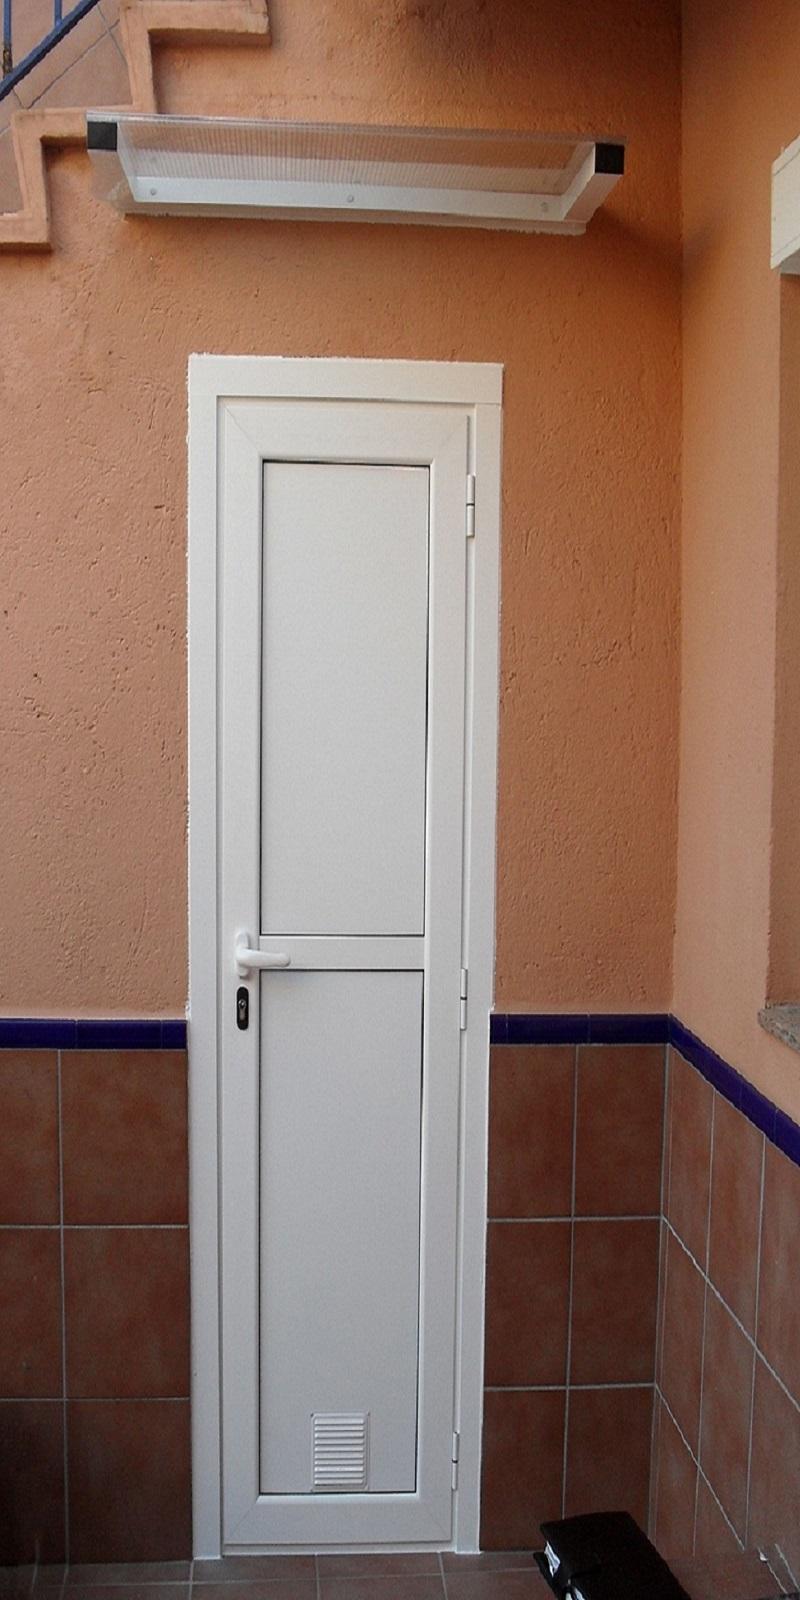 Alumam carpinter a de aluminio sabadell puertas - Puerta balconera aluminio ...